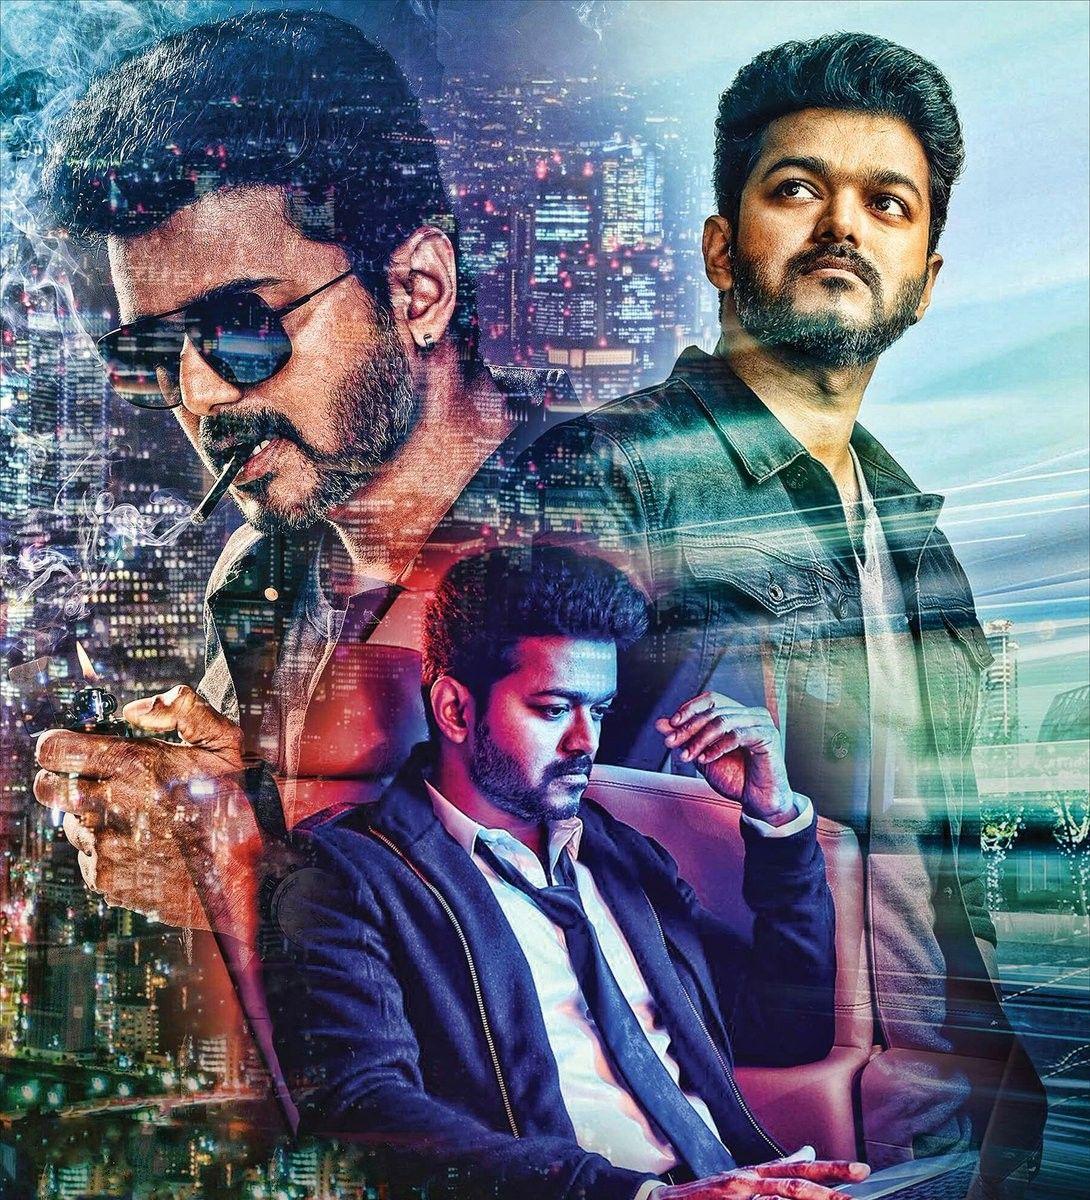 mass loaded fan edit 😎 | Vijay in 2019 | Vijay actor, Surya